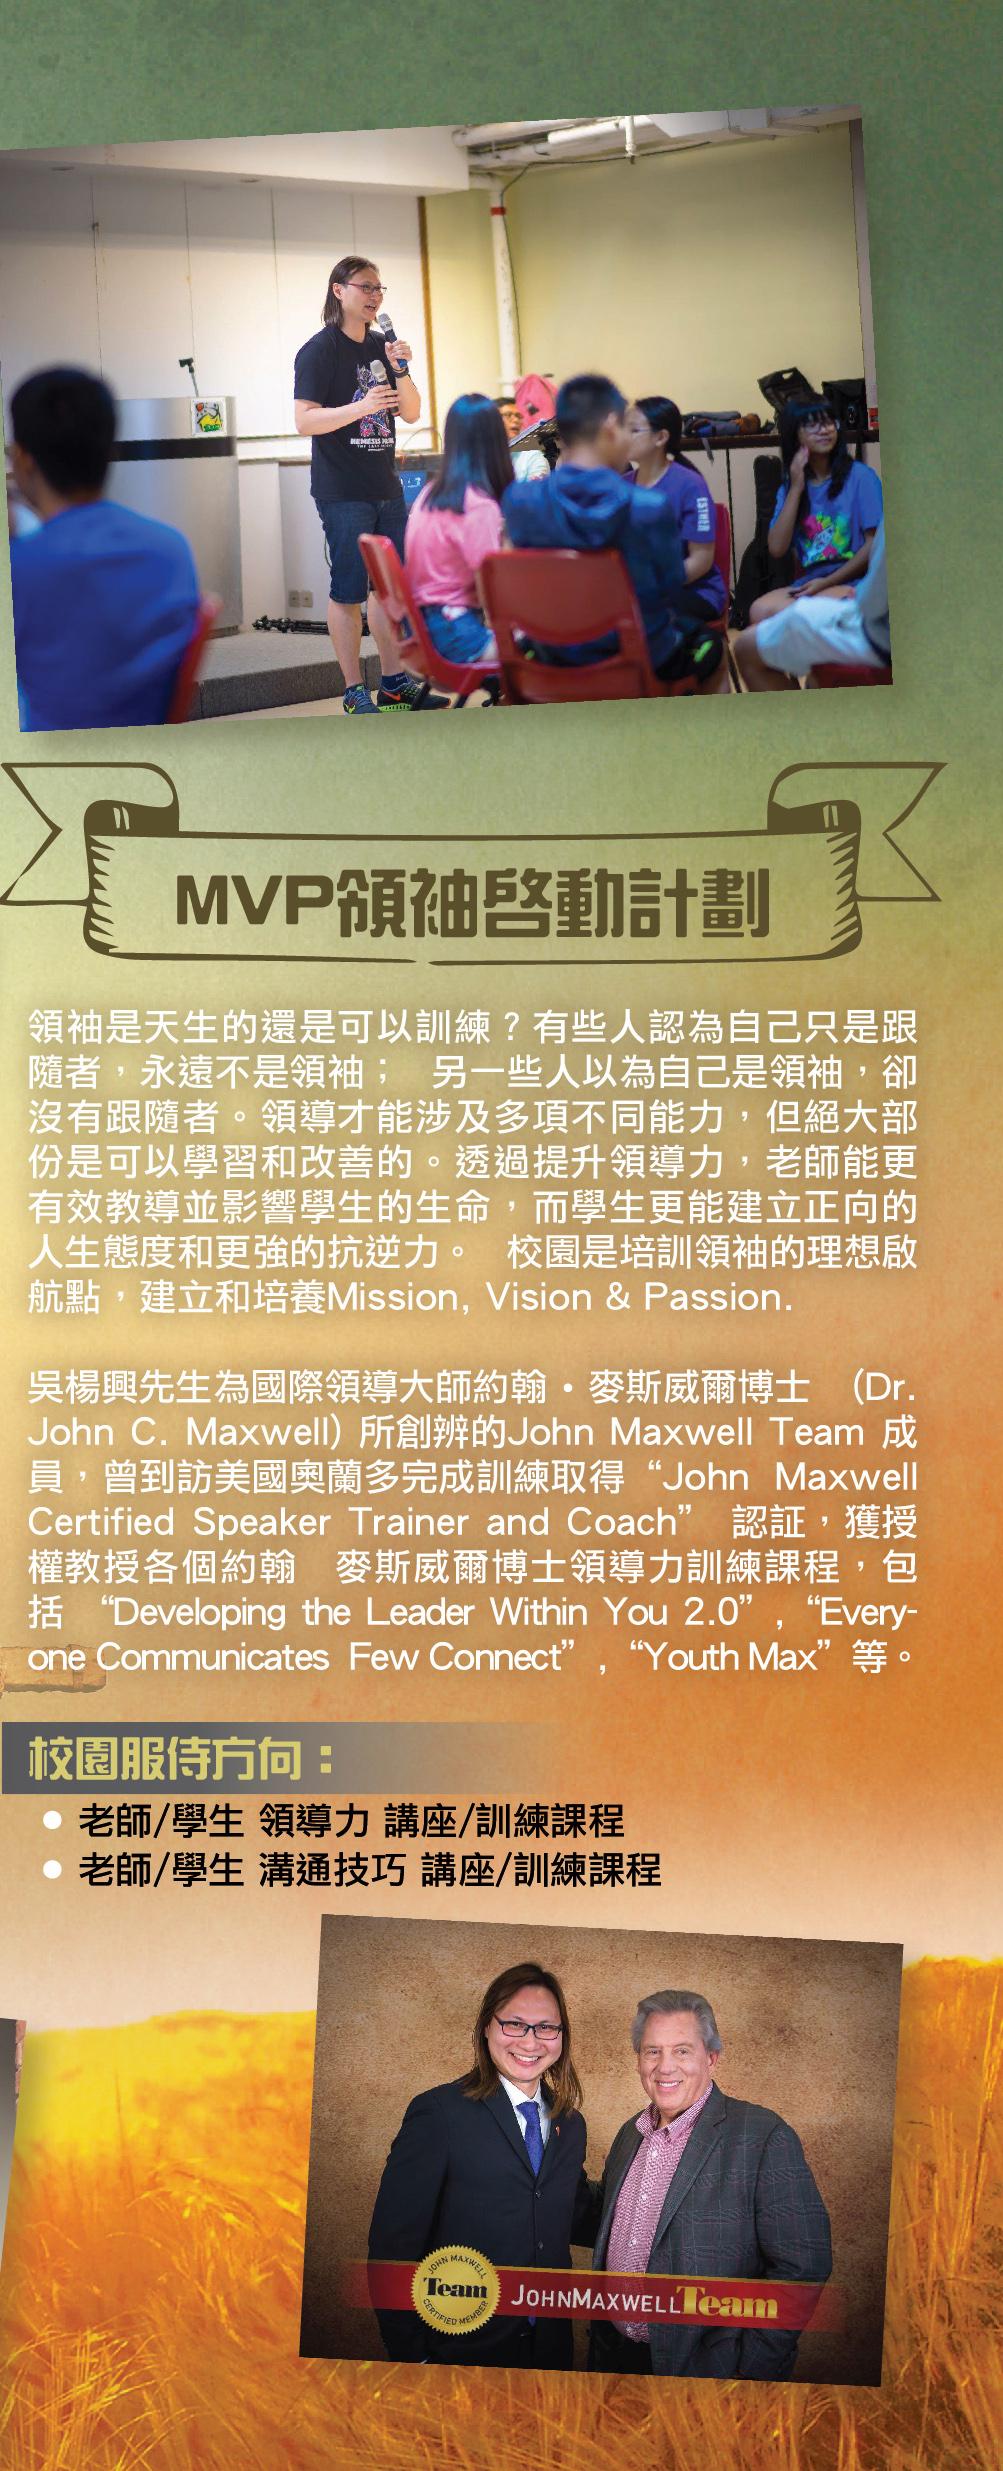 MVP領袖啟動計劃